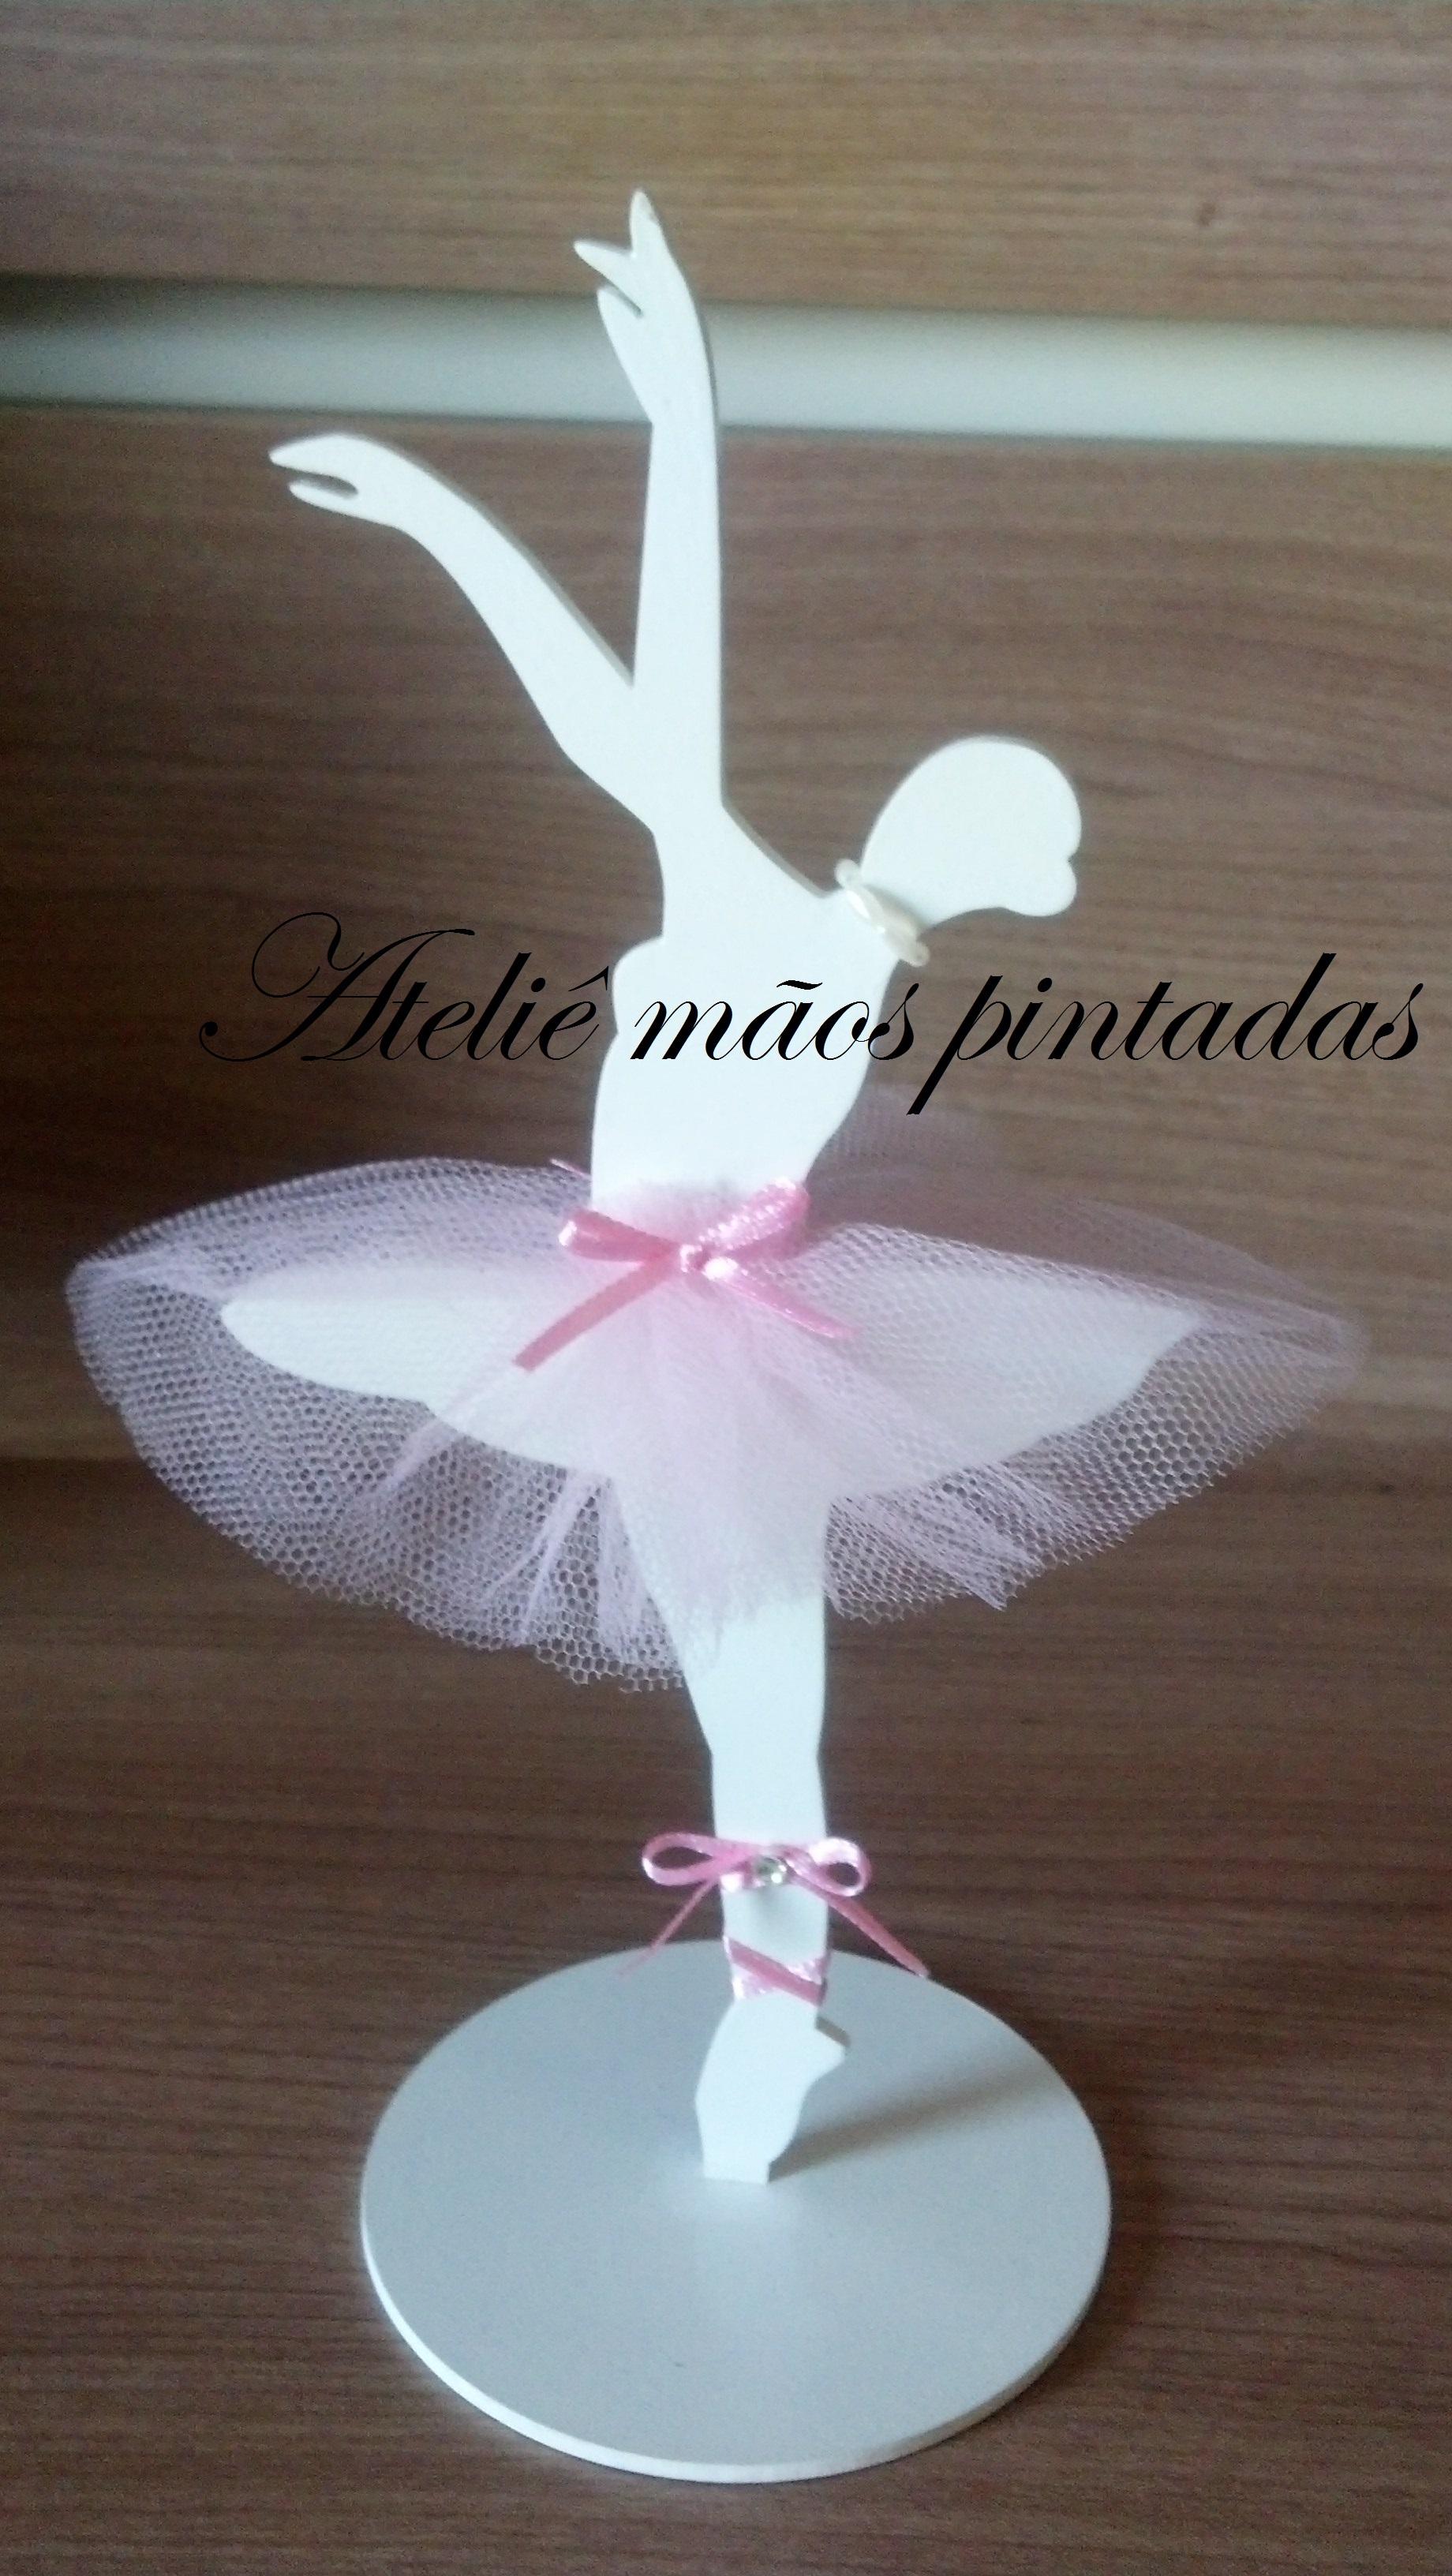 Centro de mesa bailarinas ateli m os pintadas elo7 - Como decorar una lapida ...